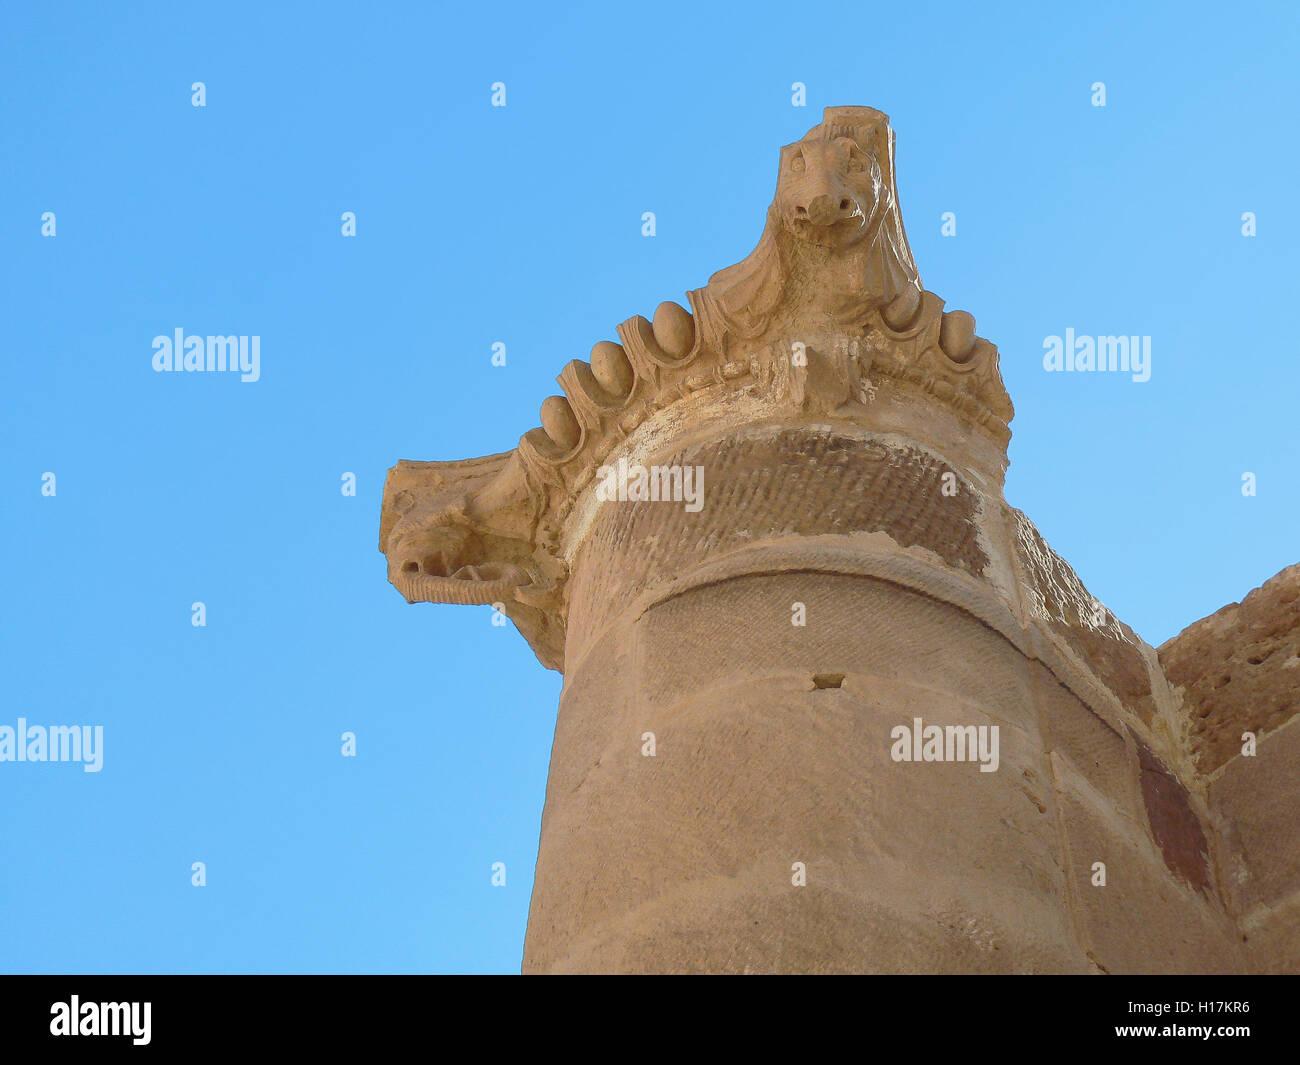 Elephant head of the Roman temple of Petra, Jordan - Stock Image